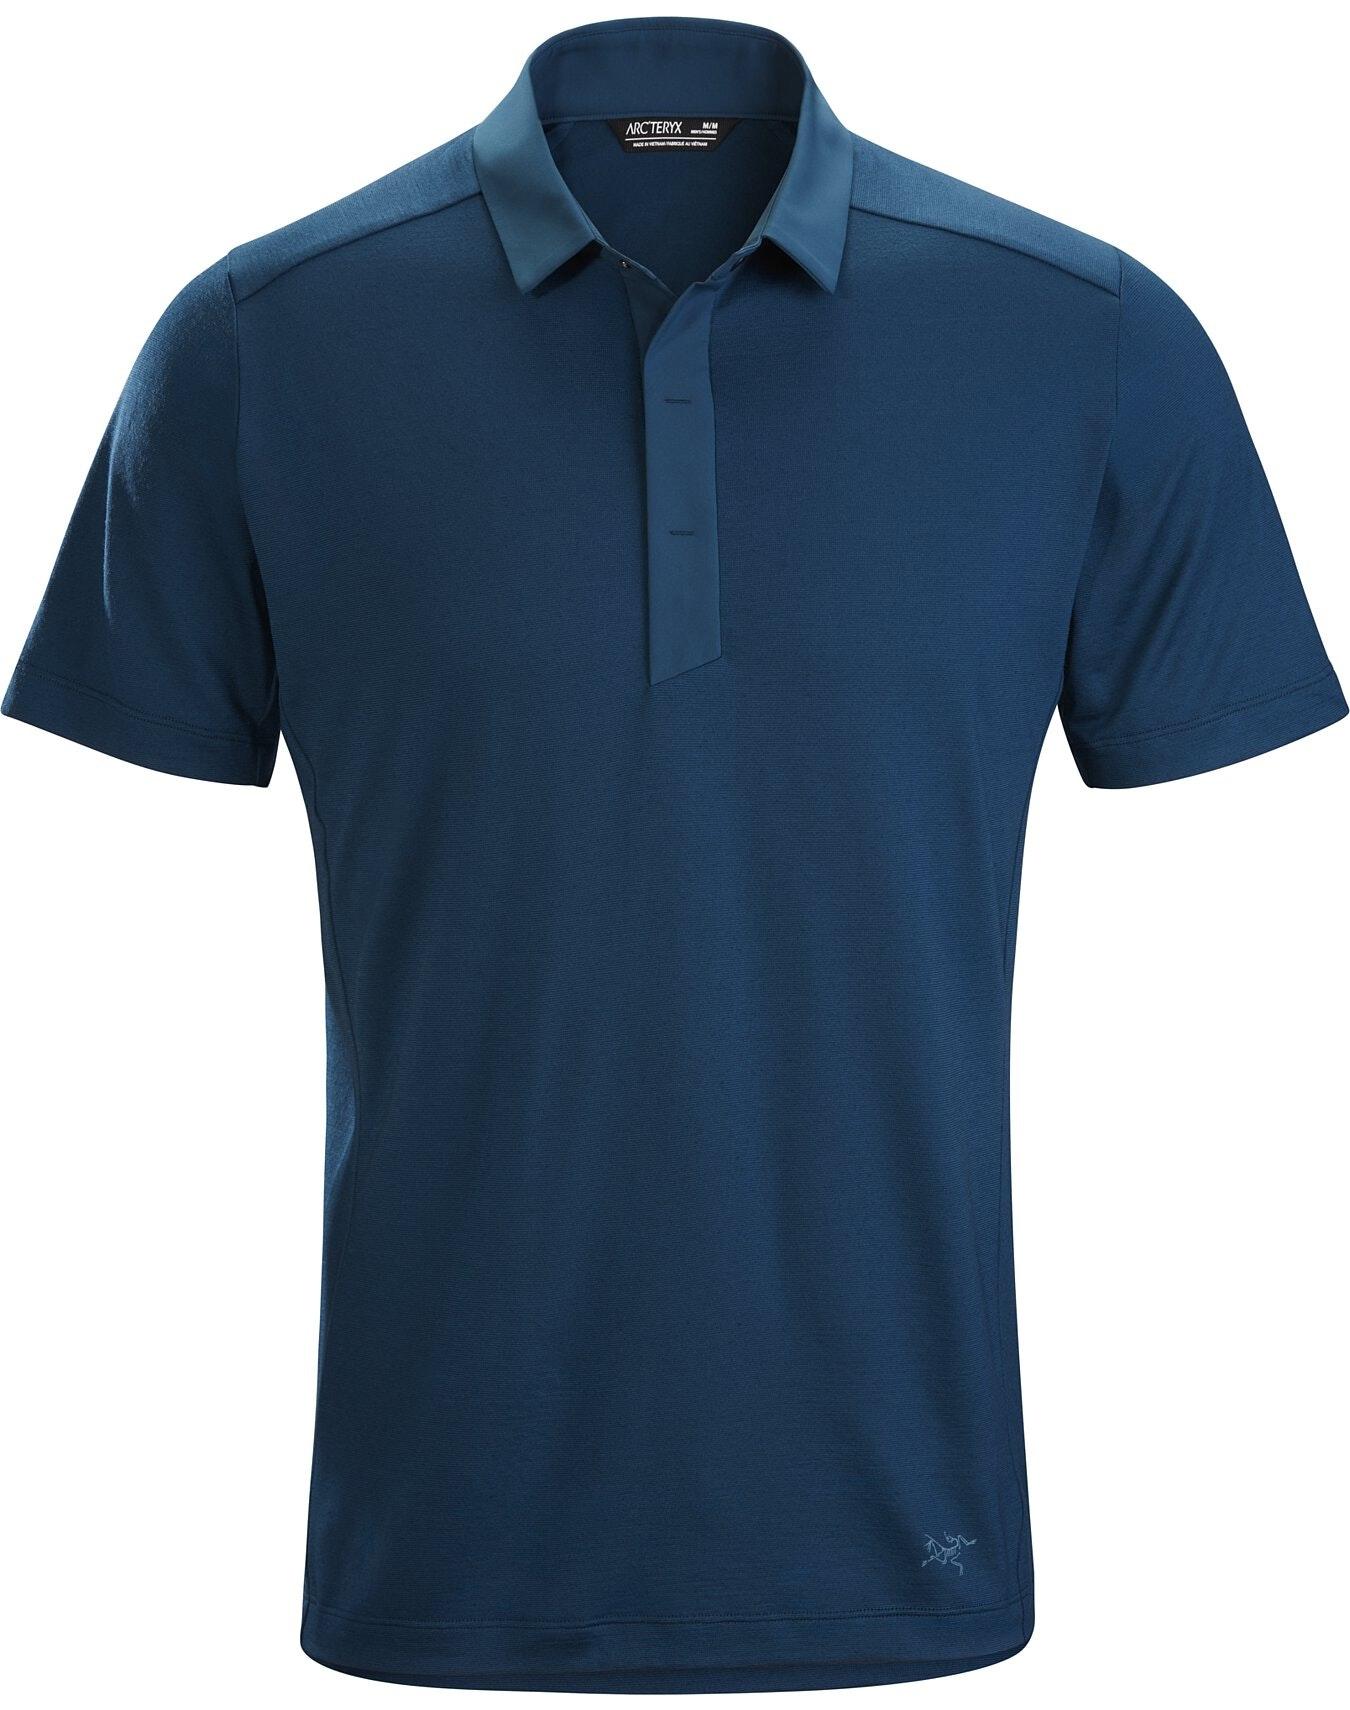 A2B Polo Shirt SS Nereus